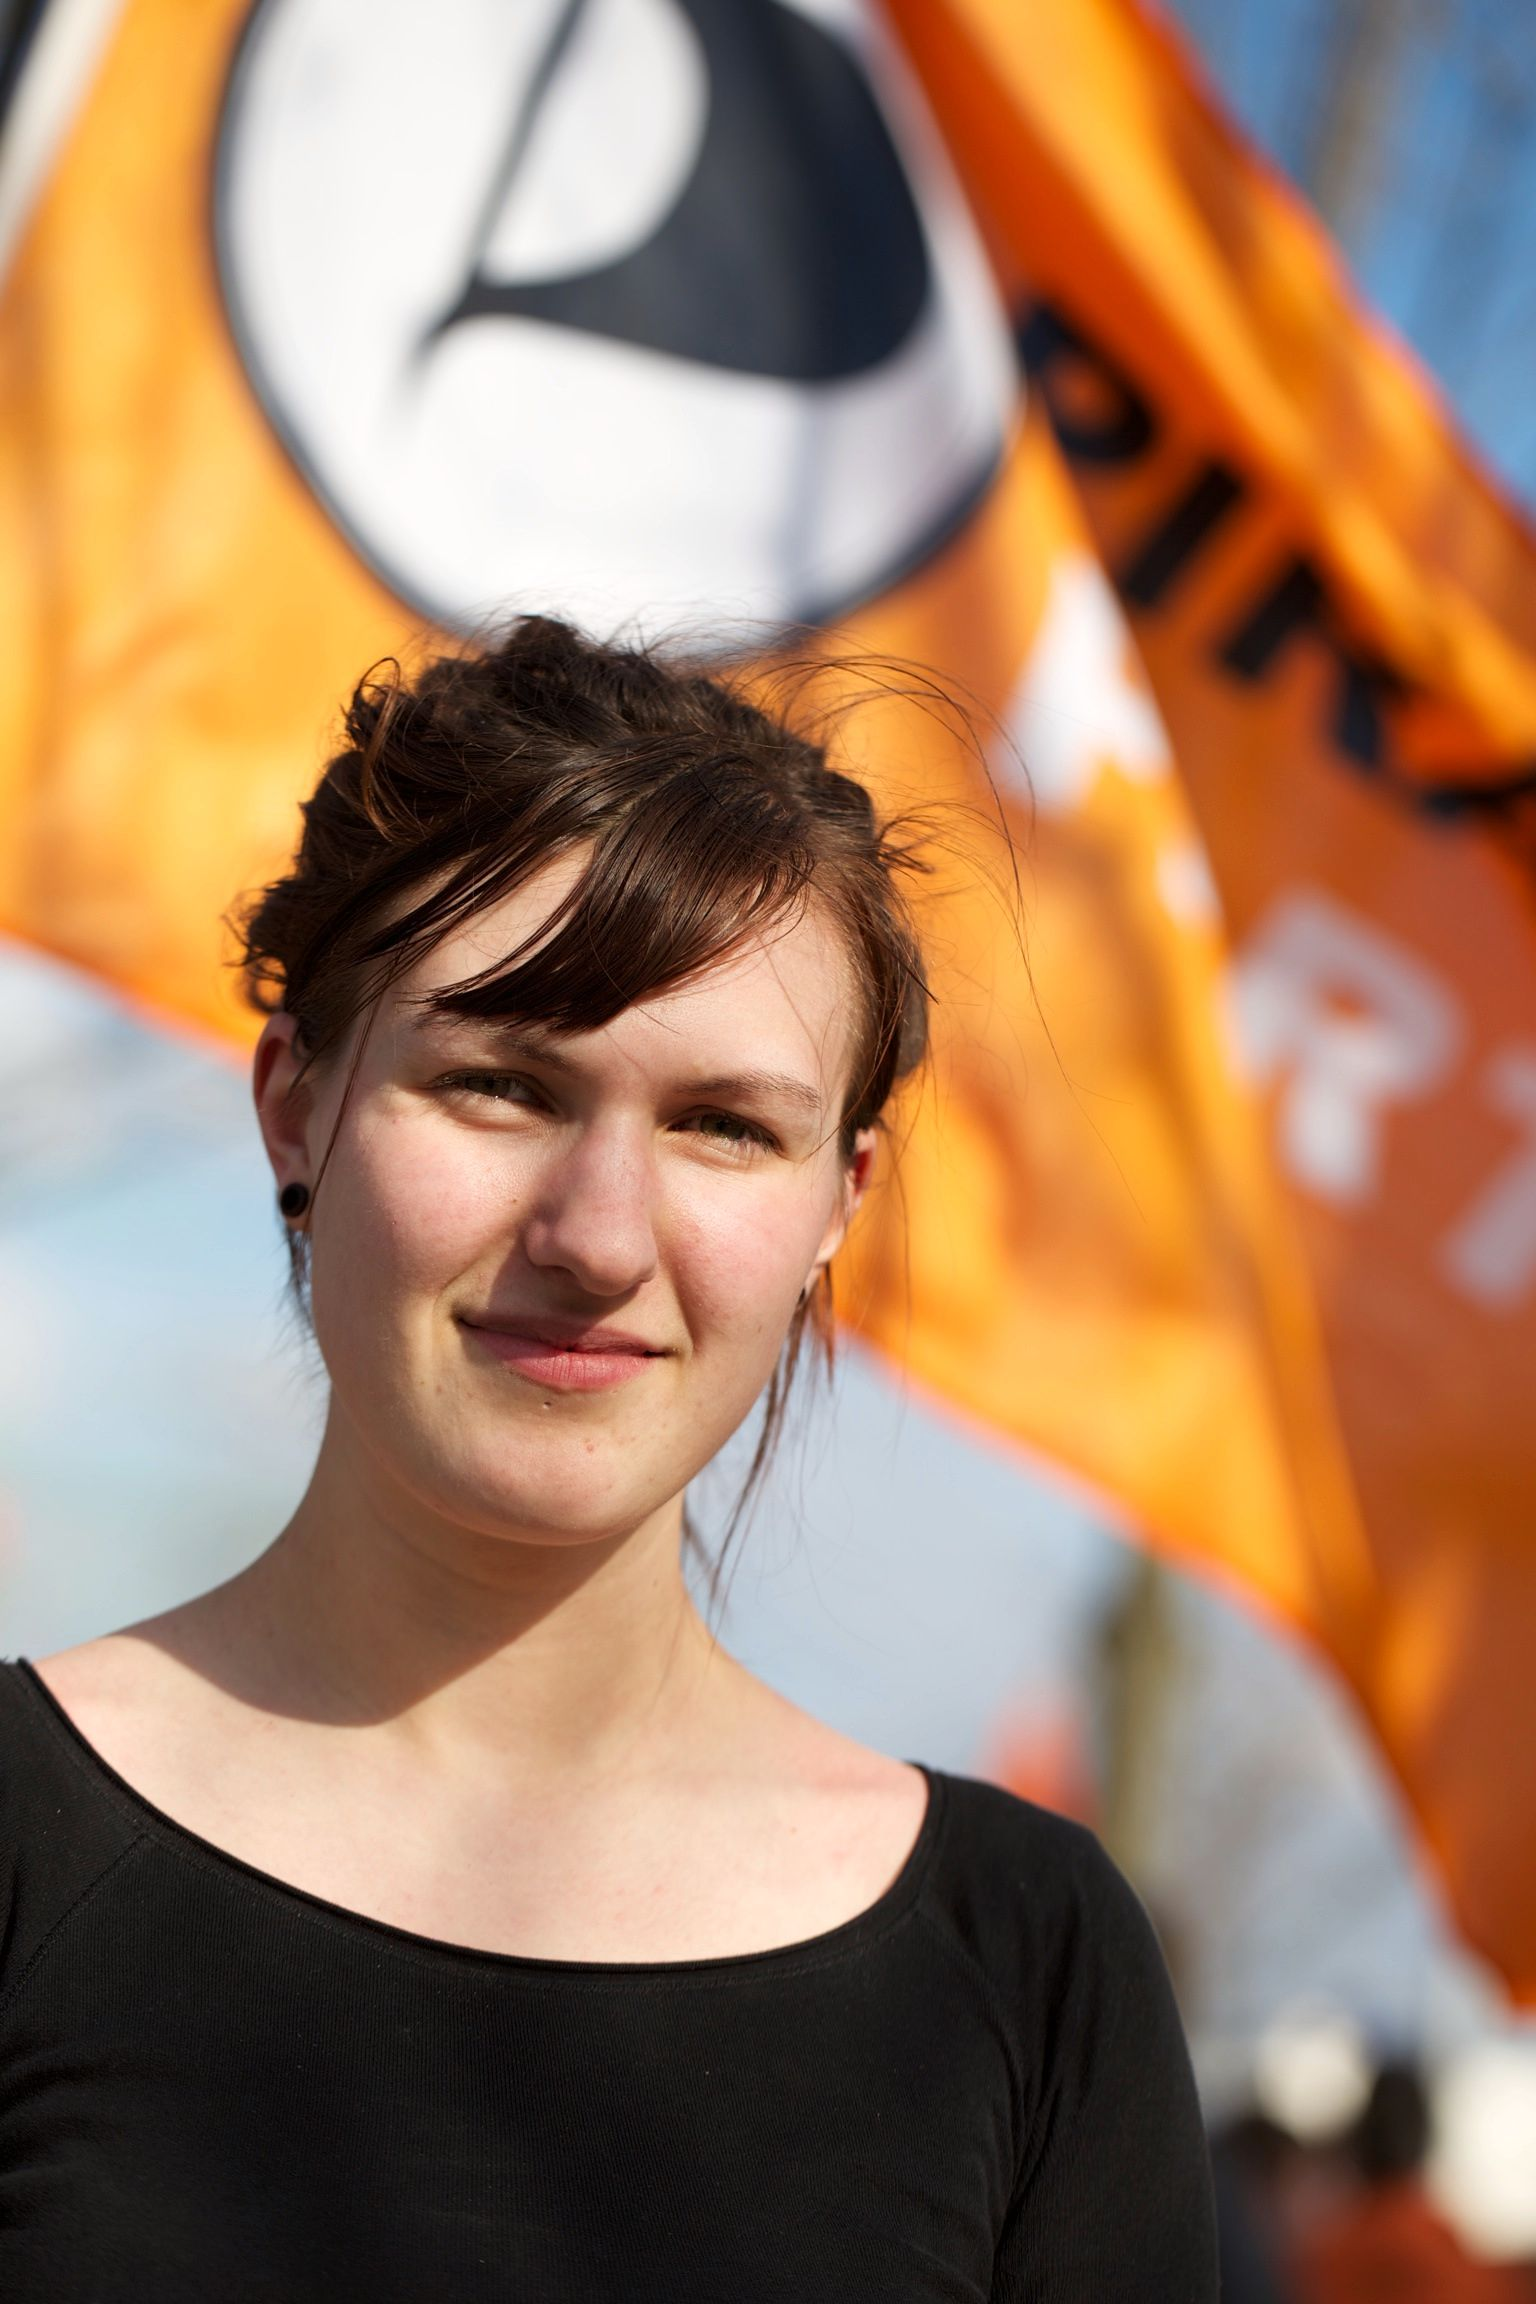 Leder i Piratpartiet i Norge, Tale Haukbjørk Østrådal, støtter tiltakene til det tsjekkiske søsterpartiet.